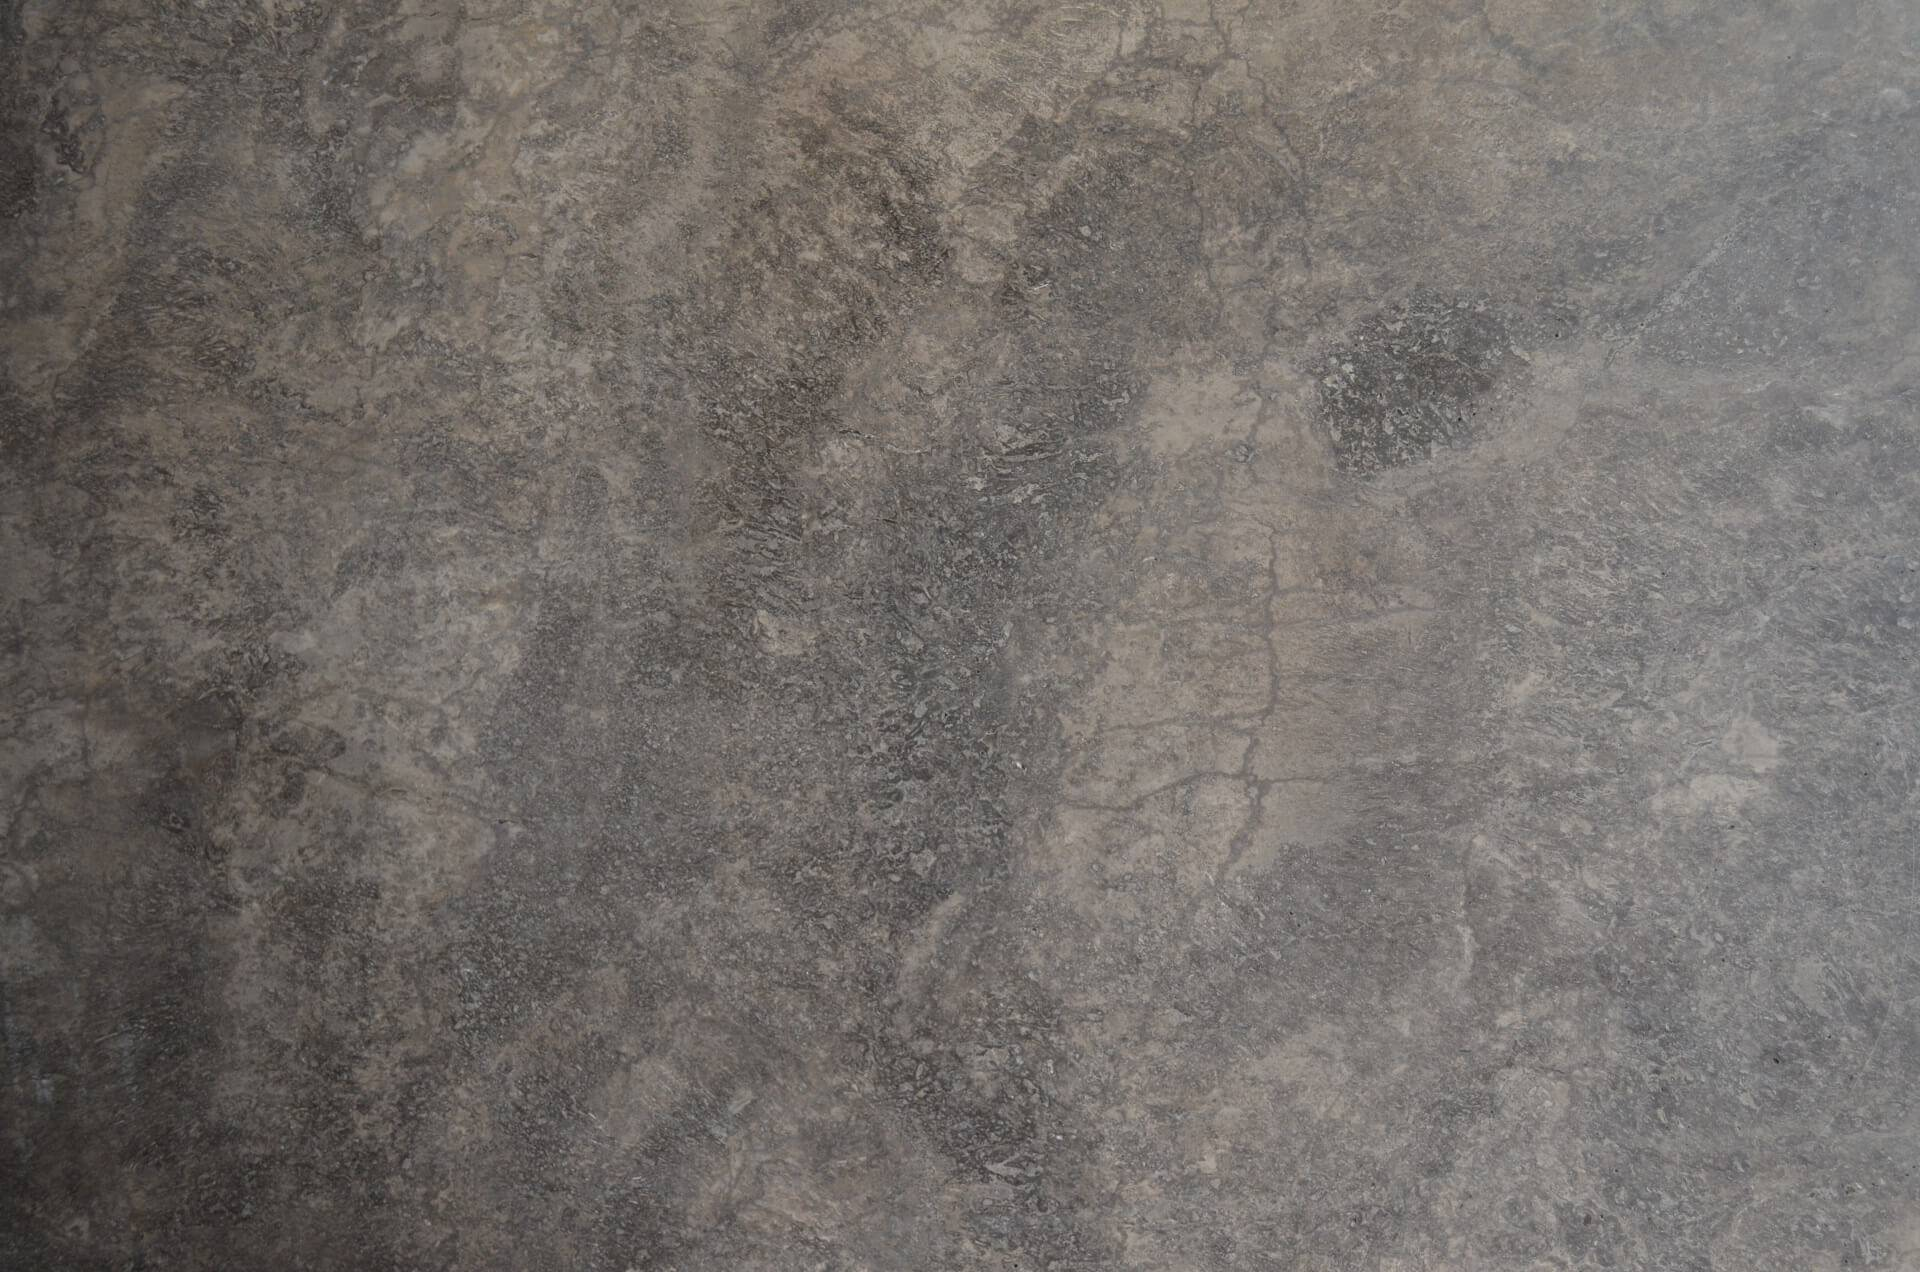 Silver Travertine фото 1 — камень от Bevers Marmyr